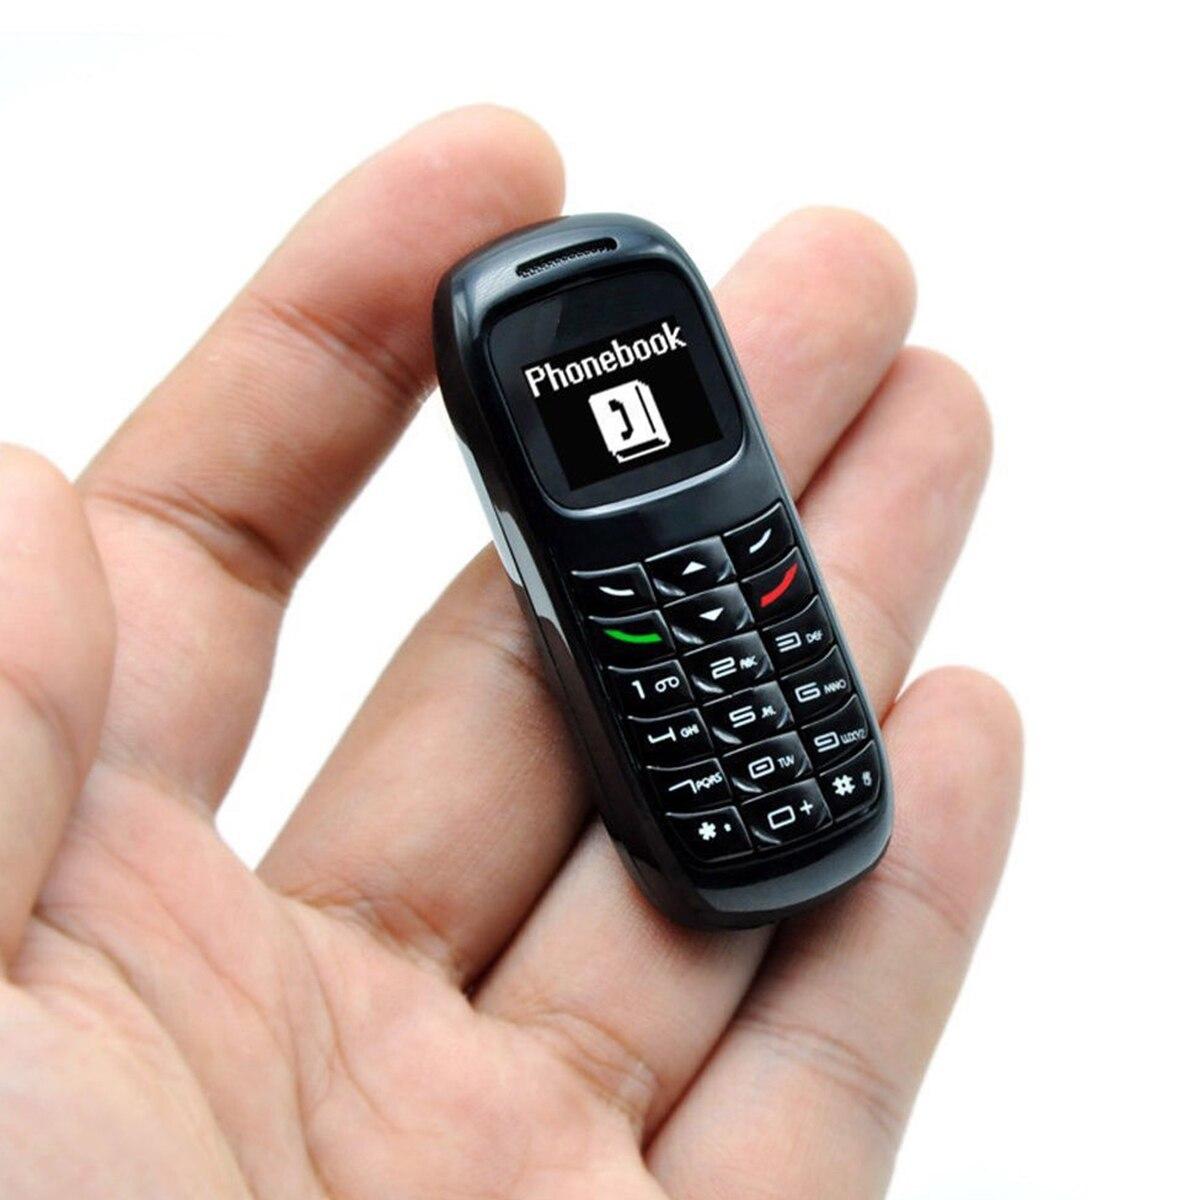 Gt Star Gtstar Bm70 Bluetooth Mini teléfonos móviles Bluetooth Dialer Universal inalámbrico auricular teléfono celular marcador BM50